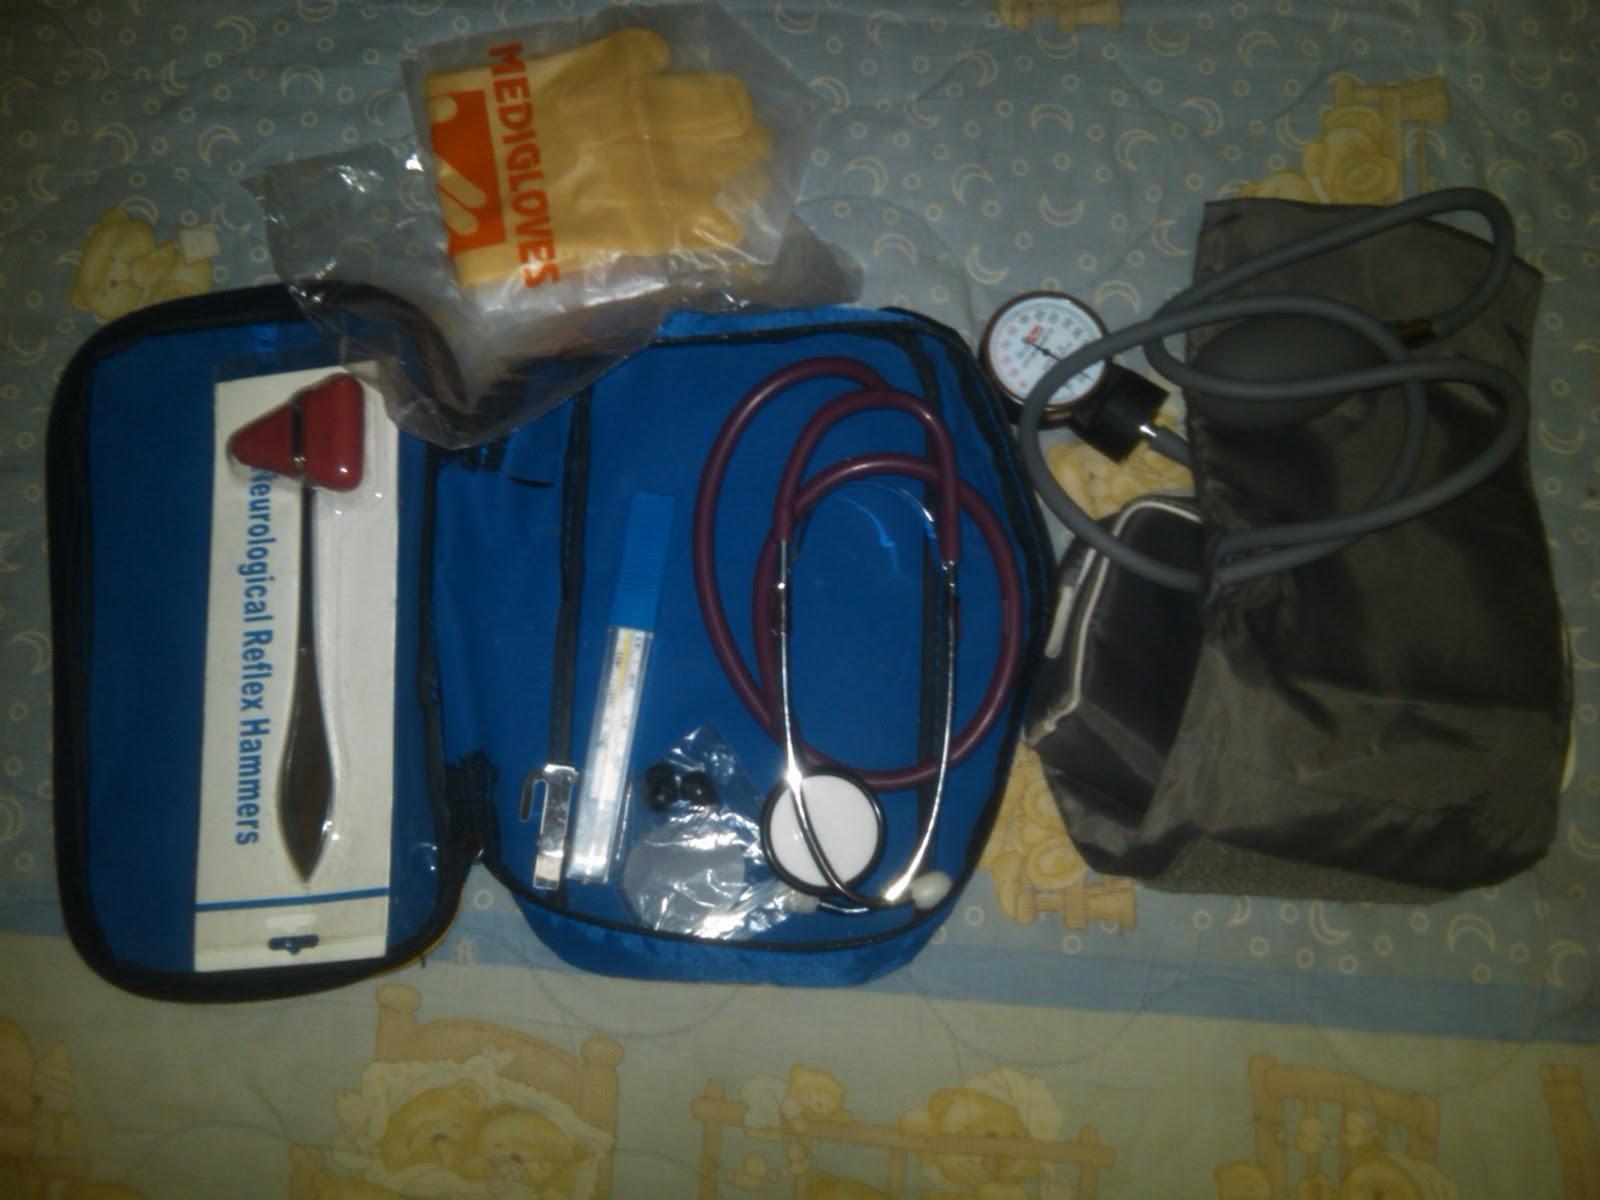 Gusti Ayu Tas Nurse Kit Paket 2 Stetoskop Tensimeter Onemed Thermometer Raksa Reflex Hammer Penlight Handscon Masker Rp 260000